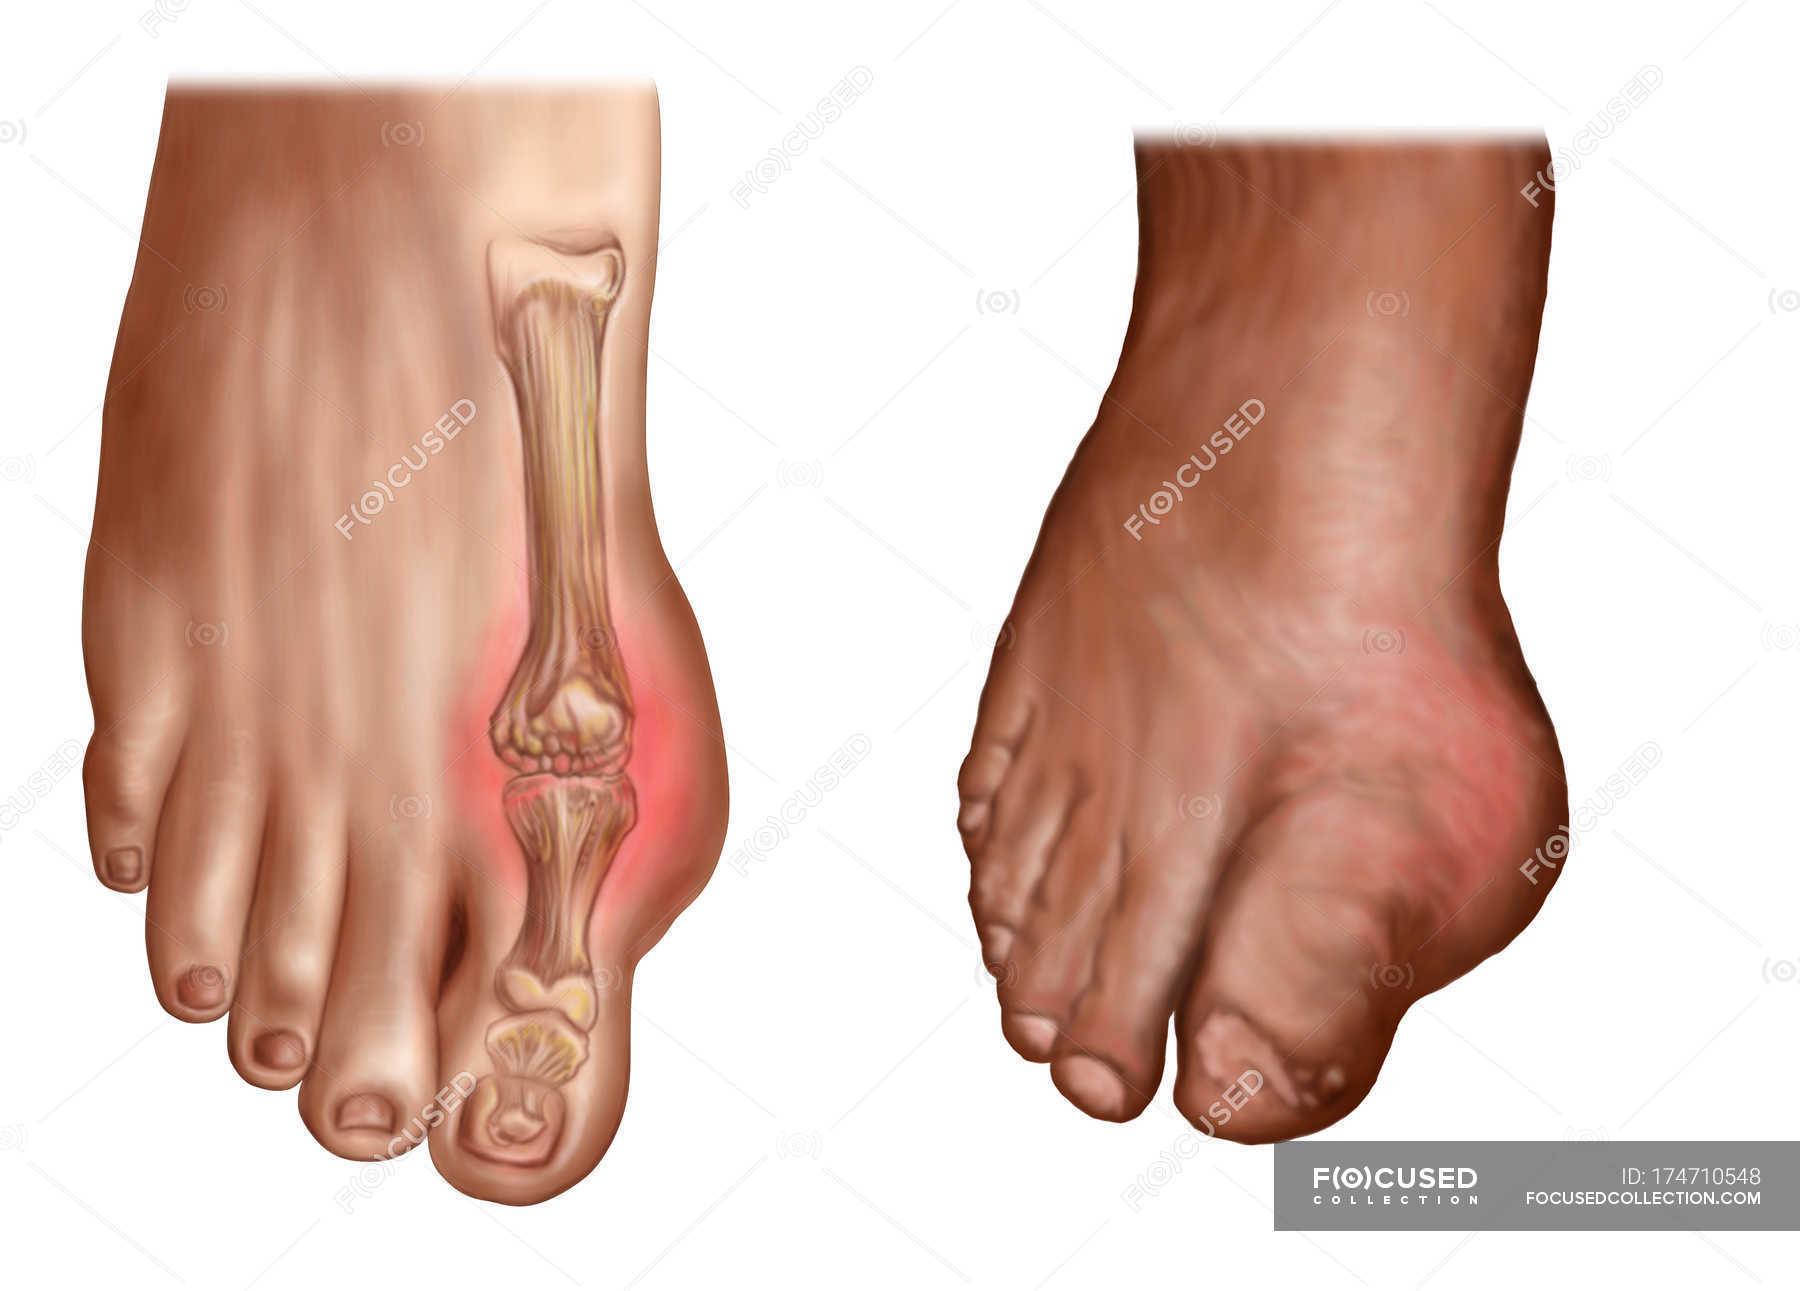 Anatomy of swollen feet on white background — Stock Photo | #174710548